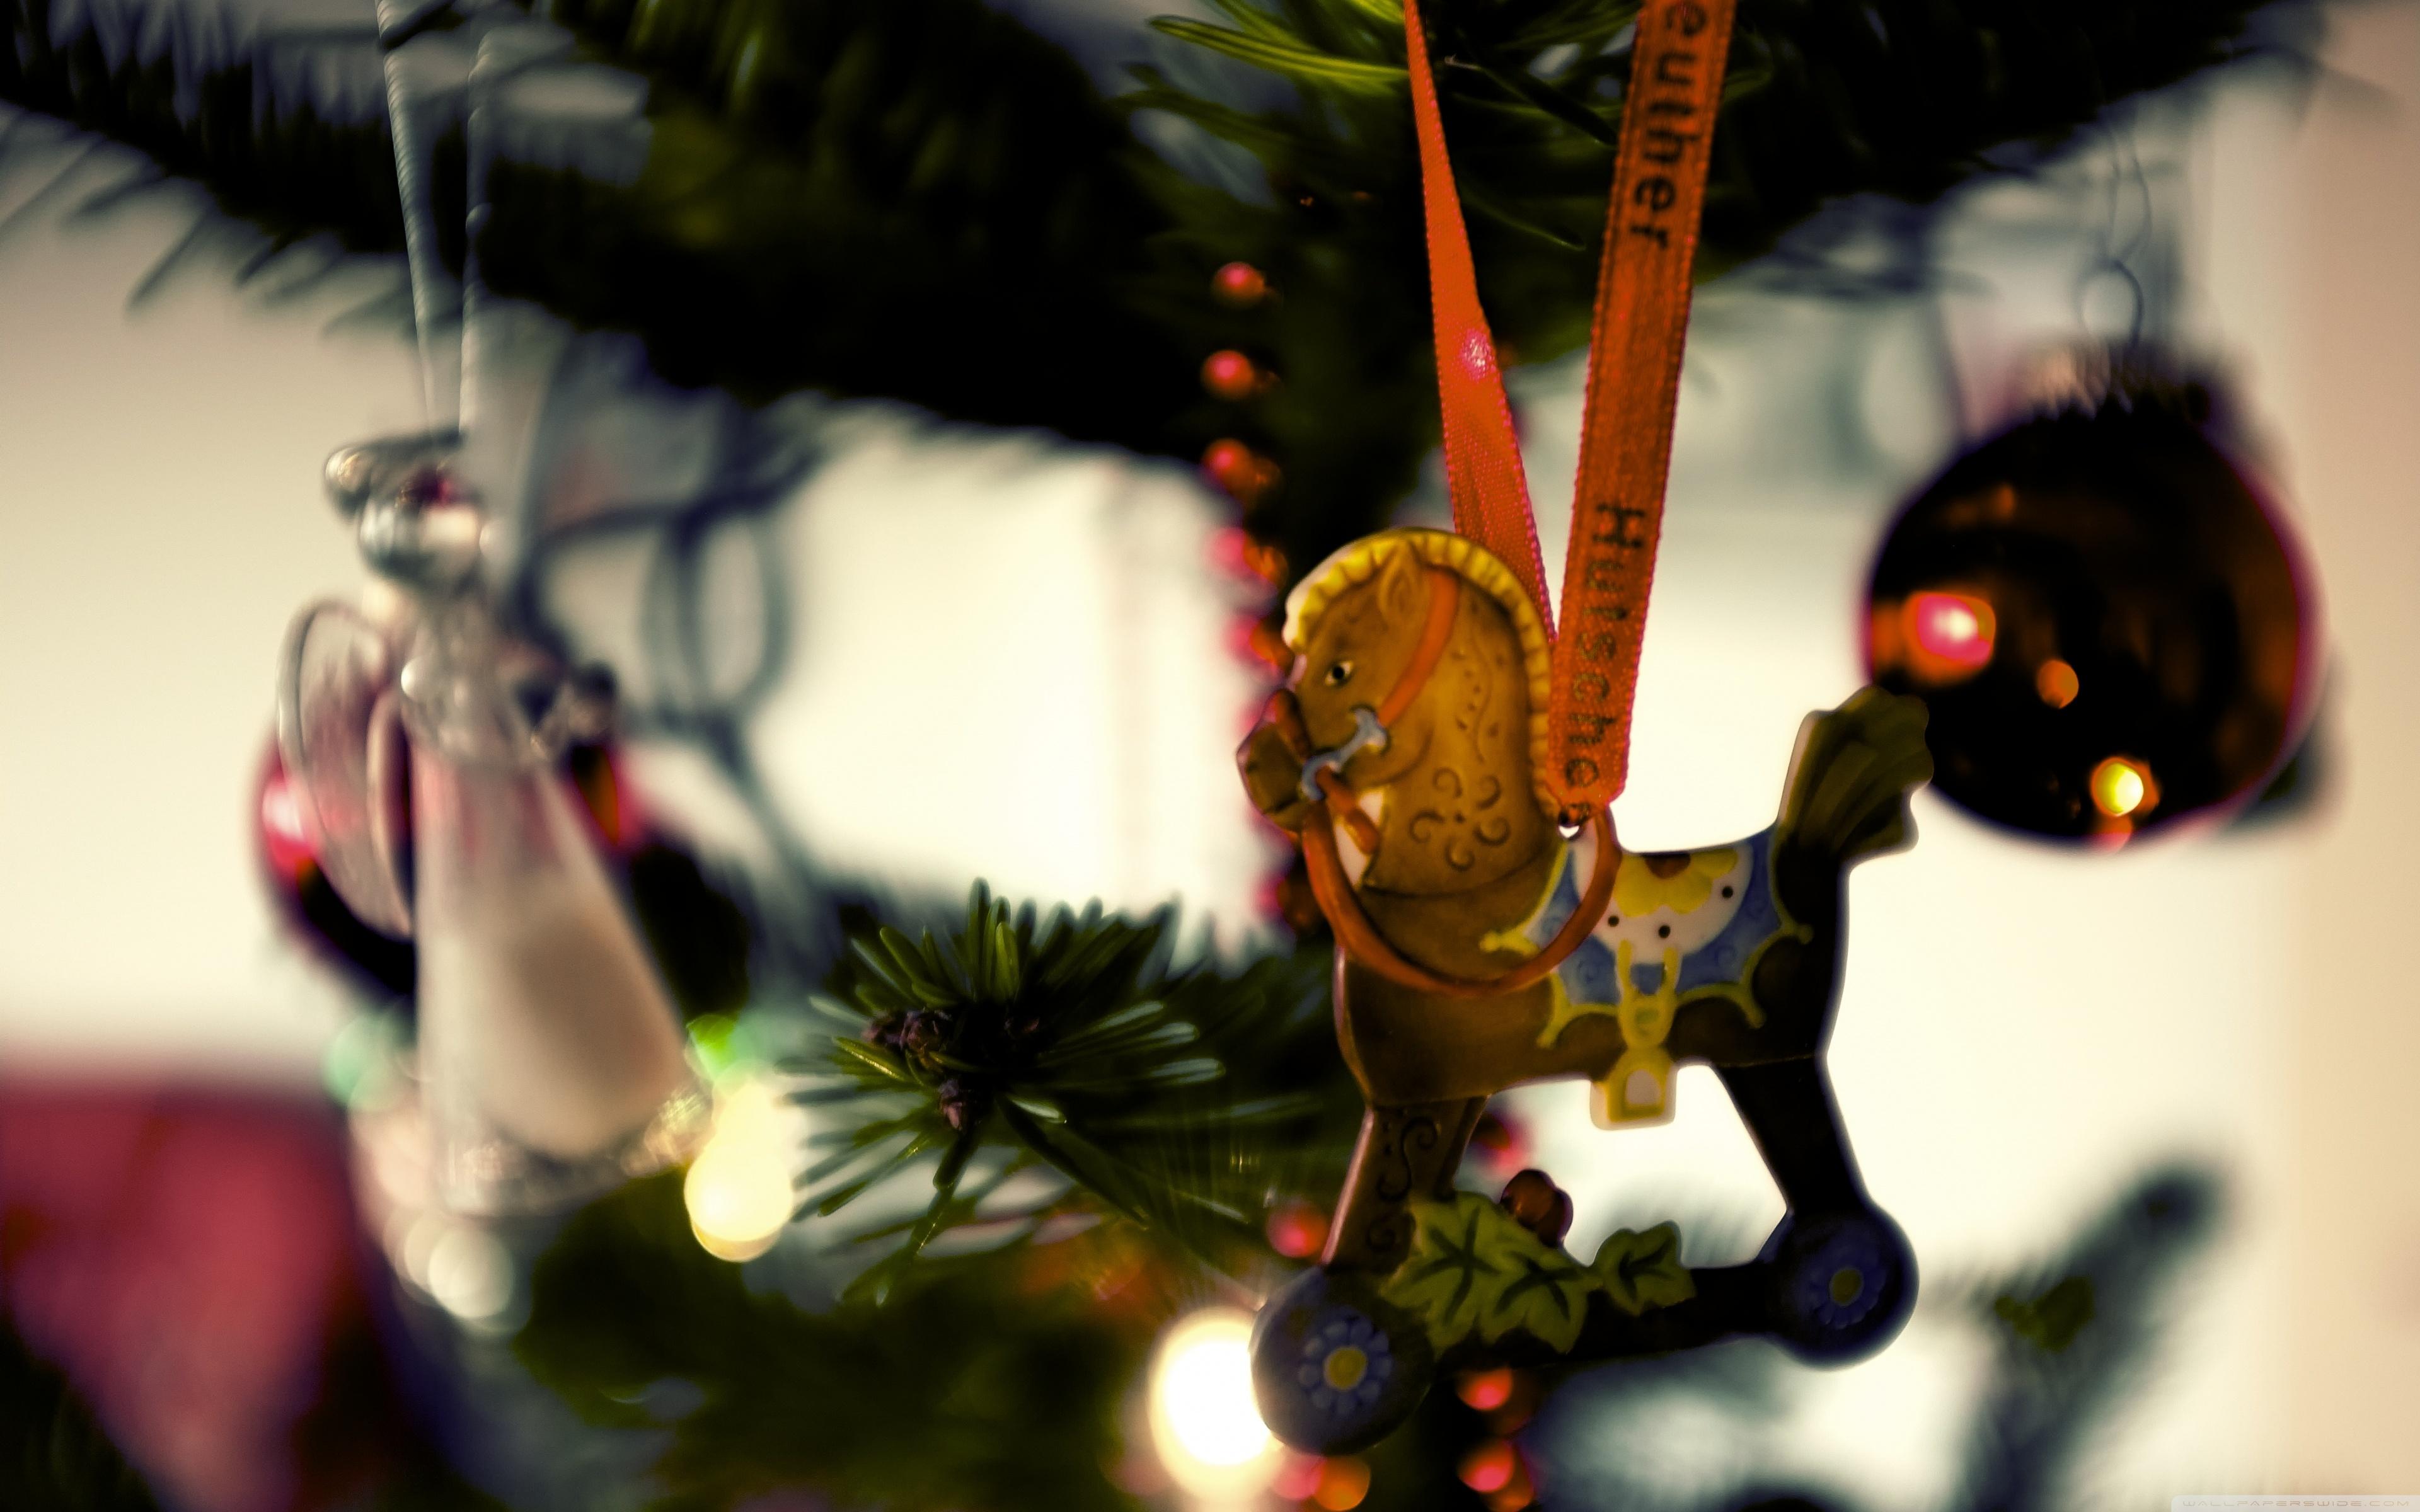 Download Free WallpaperHorse Christmas Tree Decoration